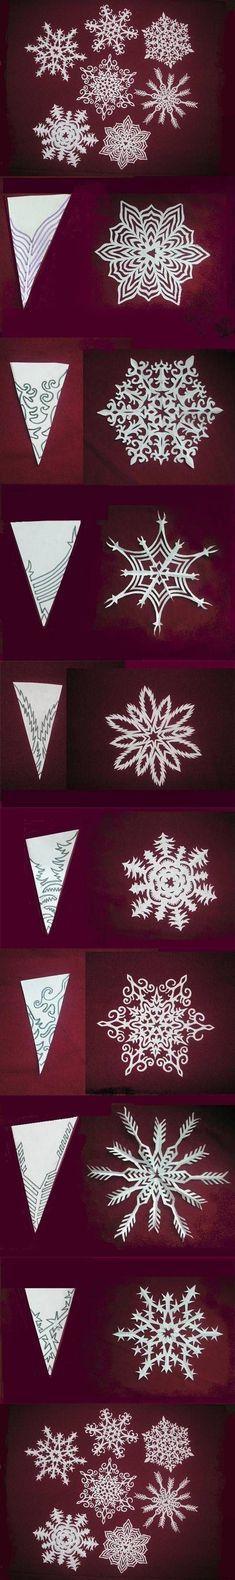 DIY Christmas Decorations – Paper snowflakes!...